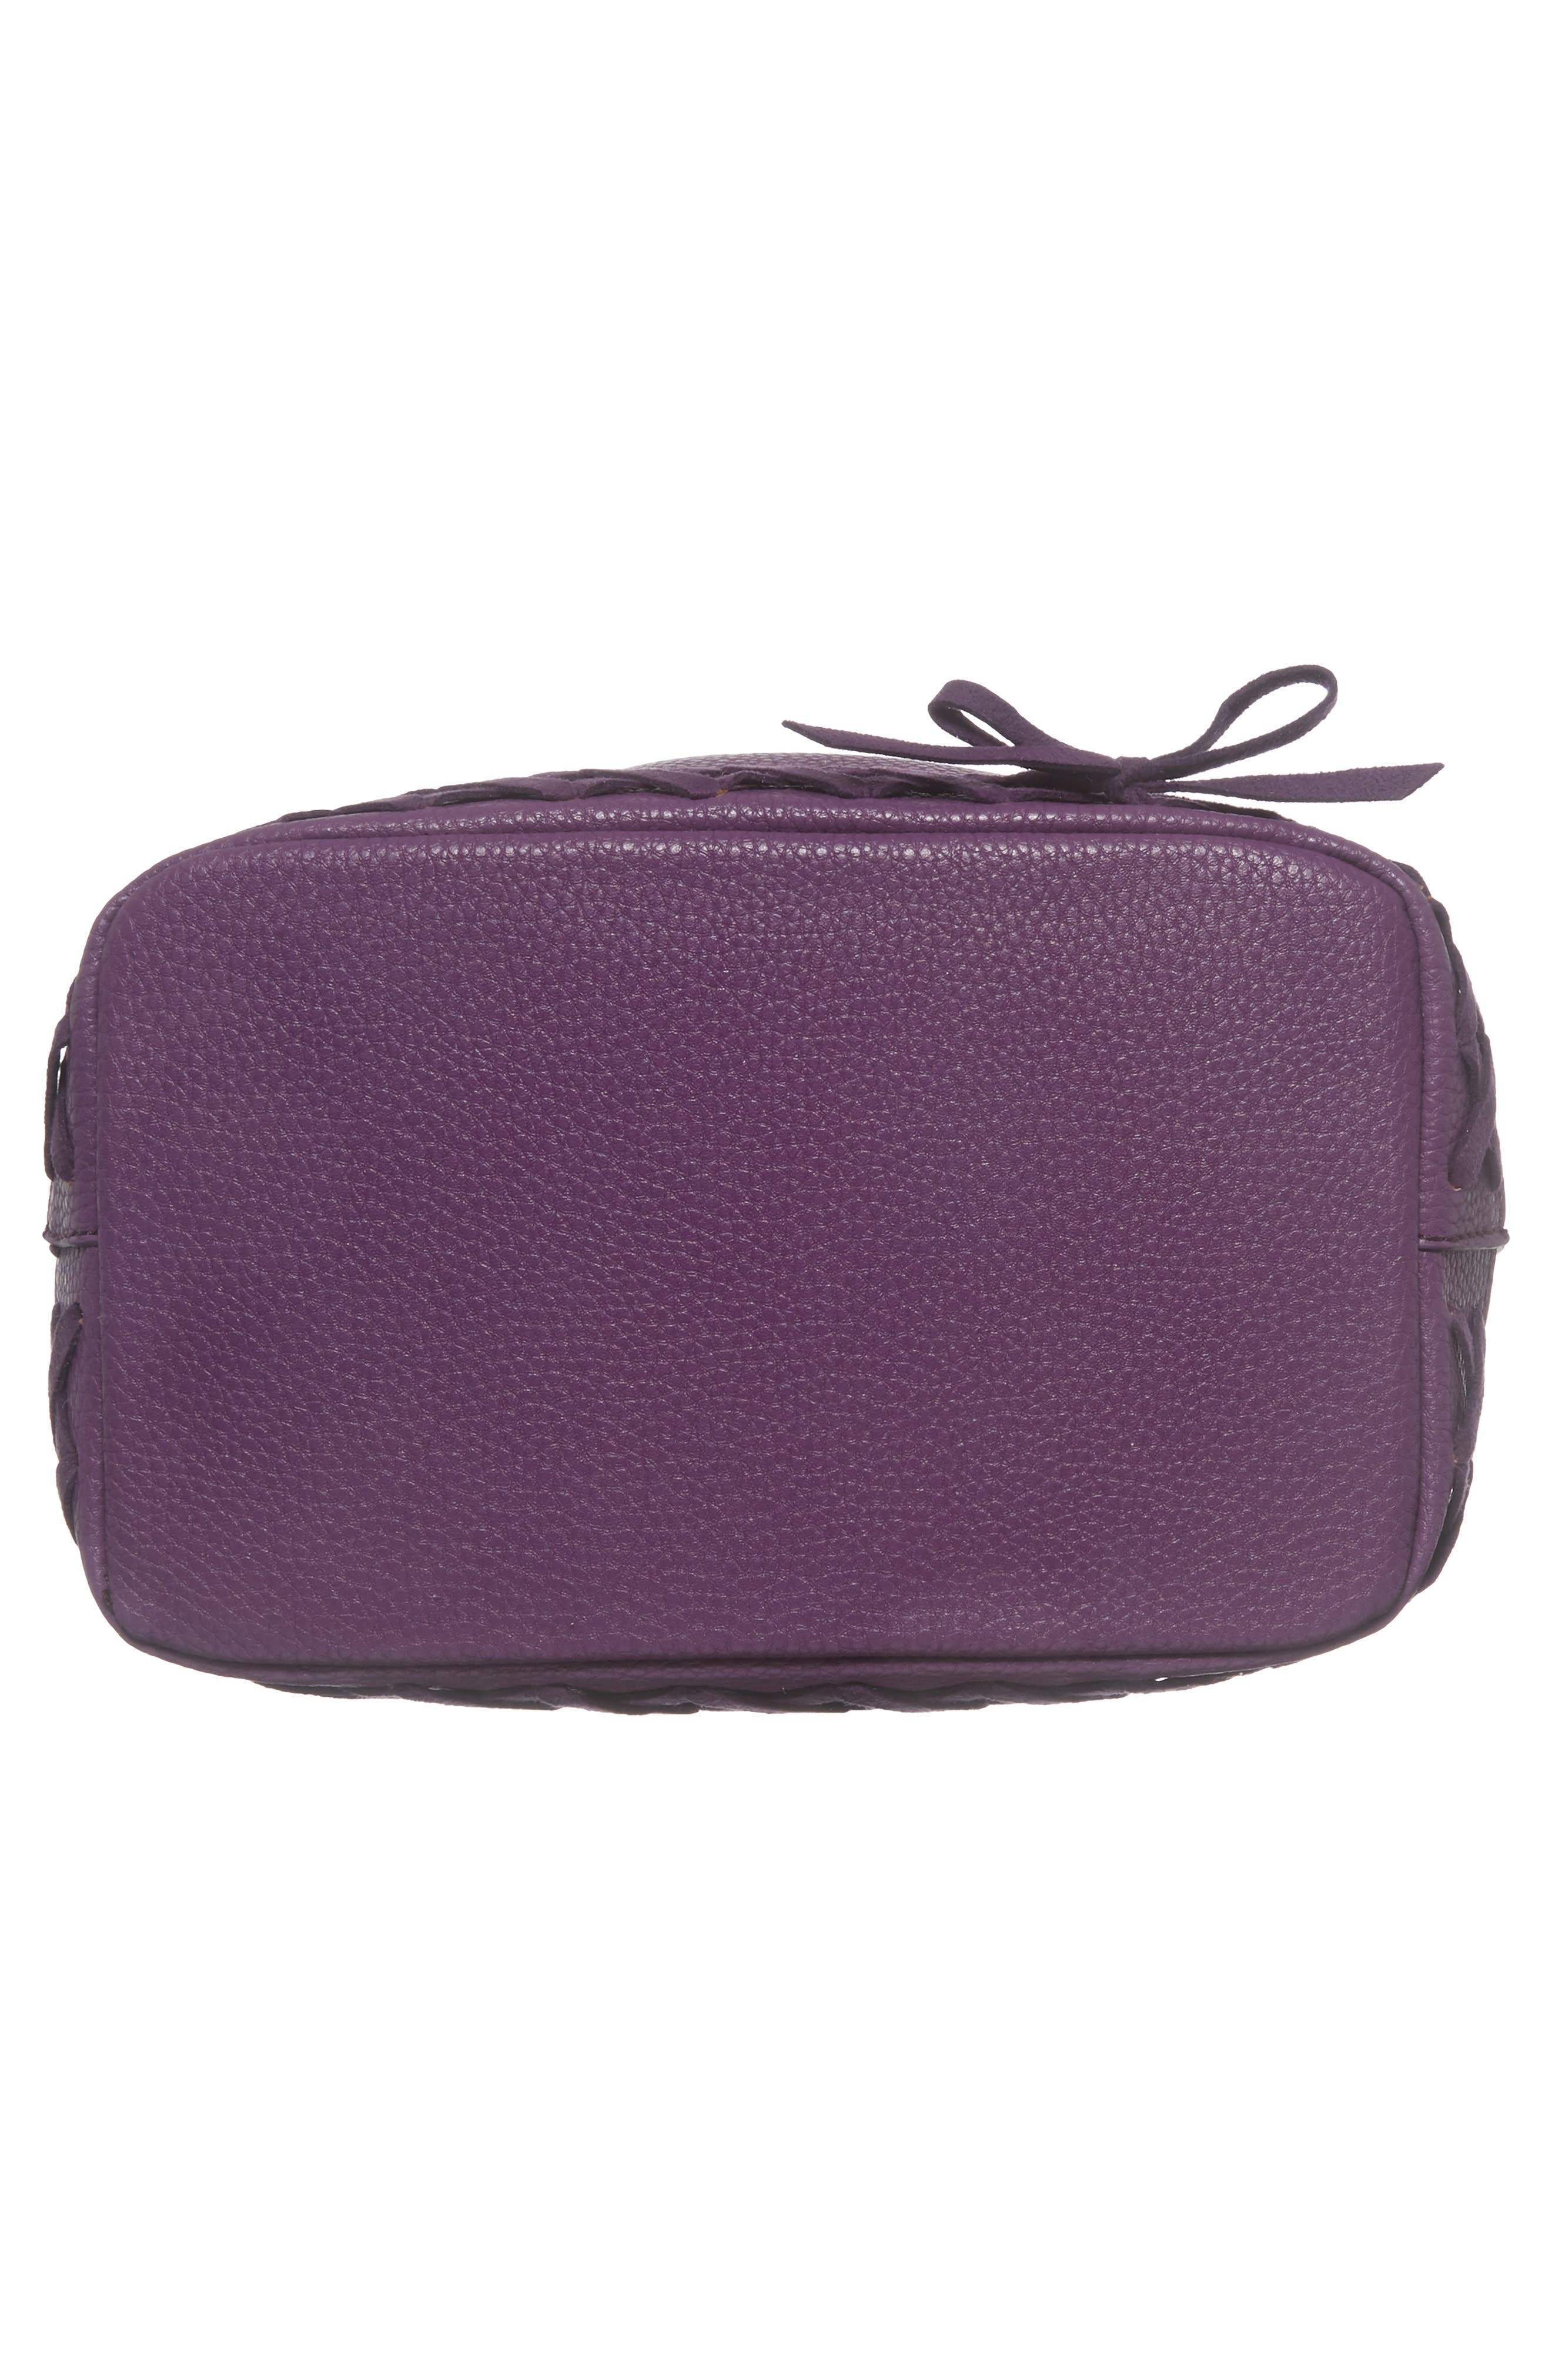 Veronica Faux Leather Bucket Bag,                             Alternate thumbnail 6, color,                             Purple